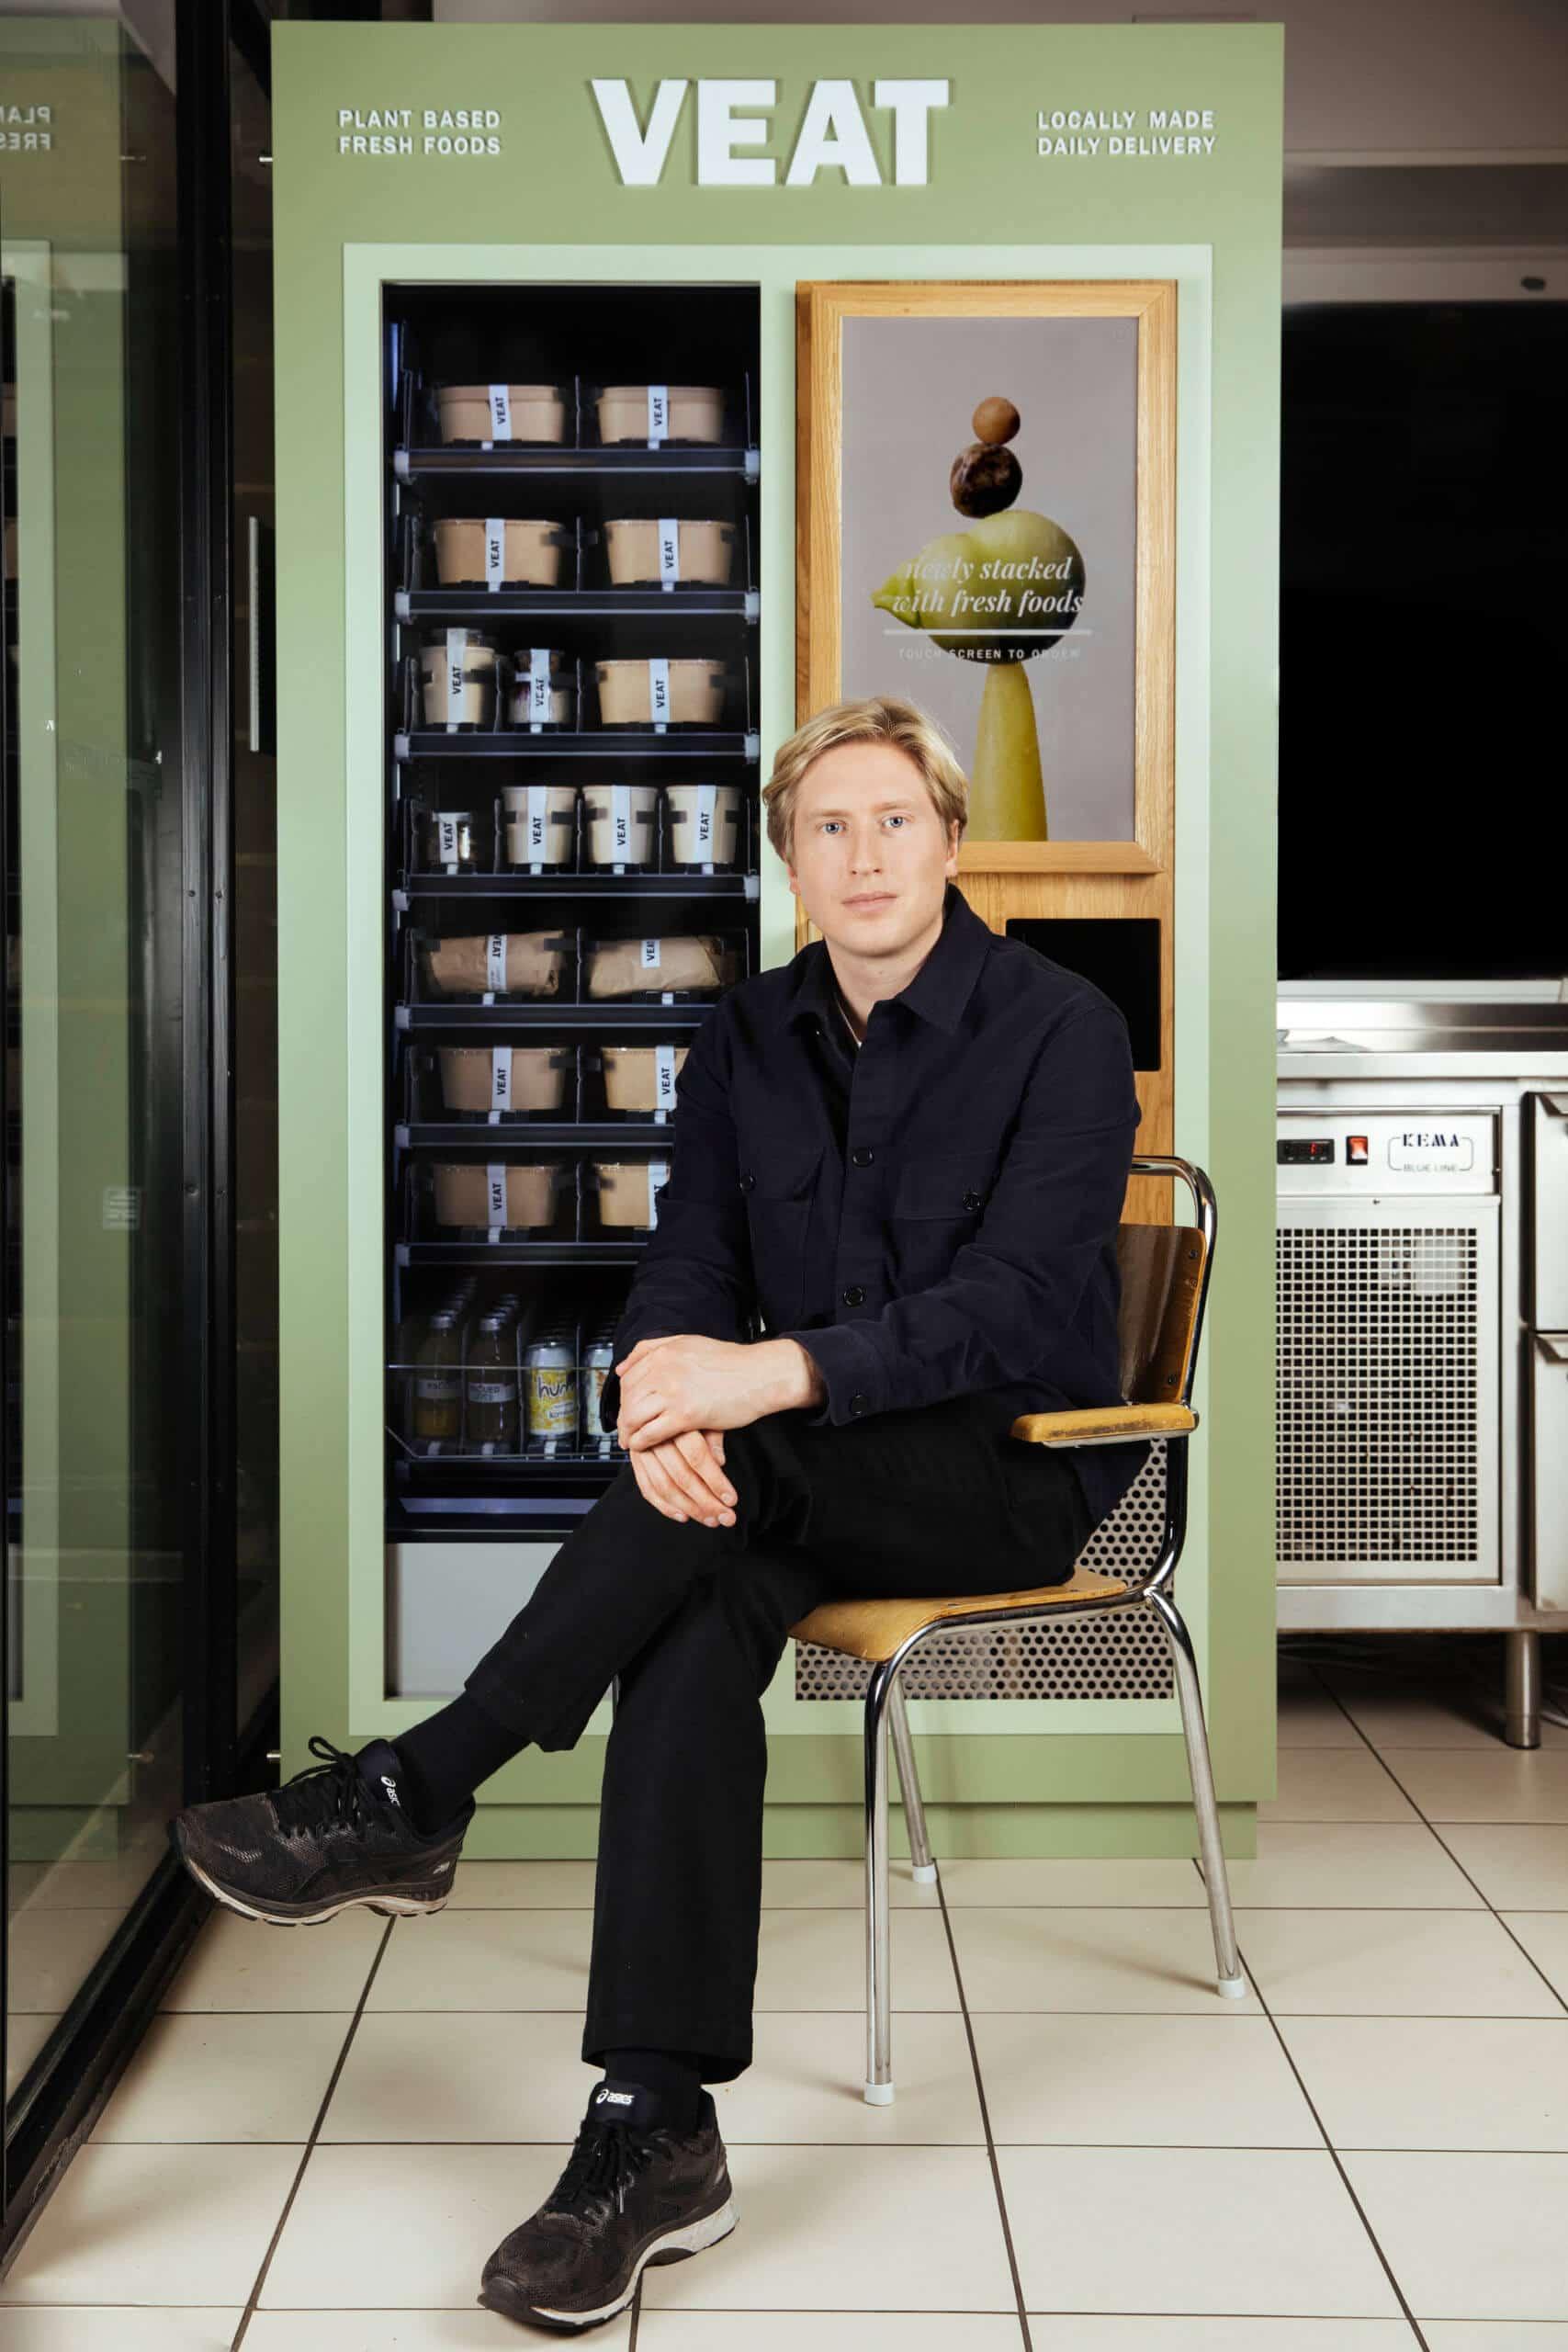 Andreas Karlsson - VEAT vending machine